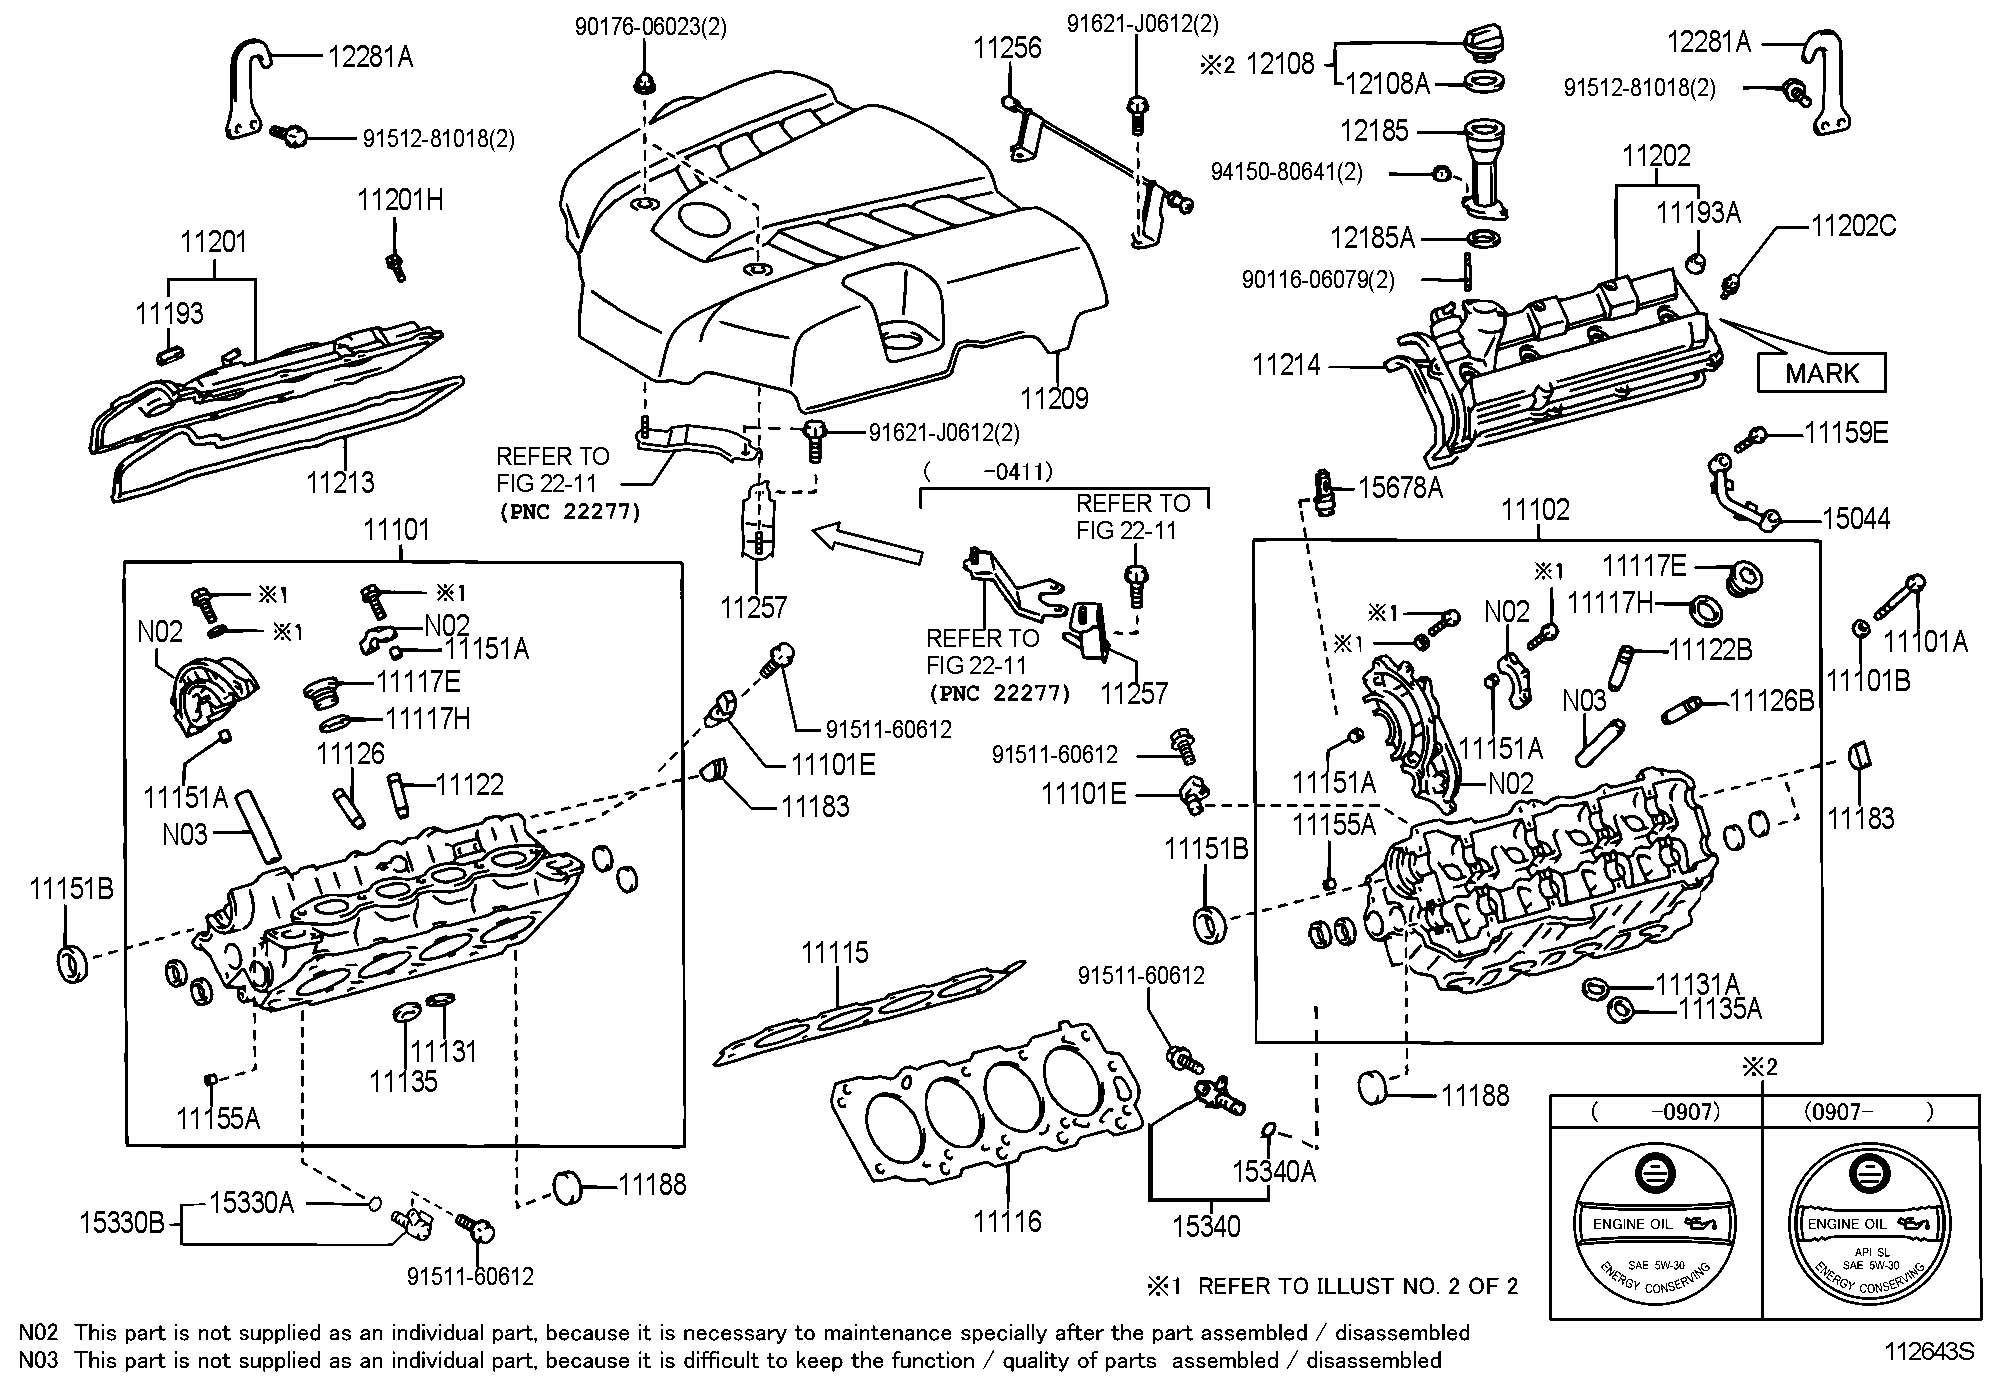 lexus es300 fuse box diagram best wiring library Lexus RX330 Problems lexus rx330 fuse box diagrams